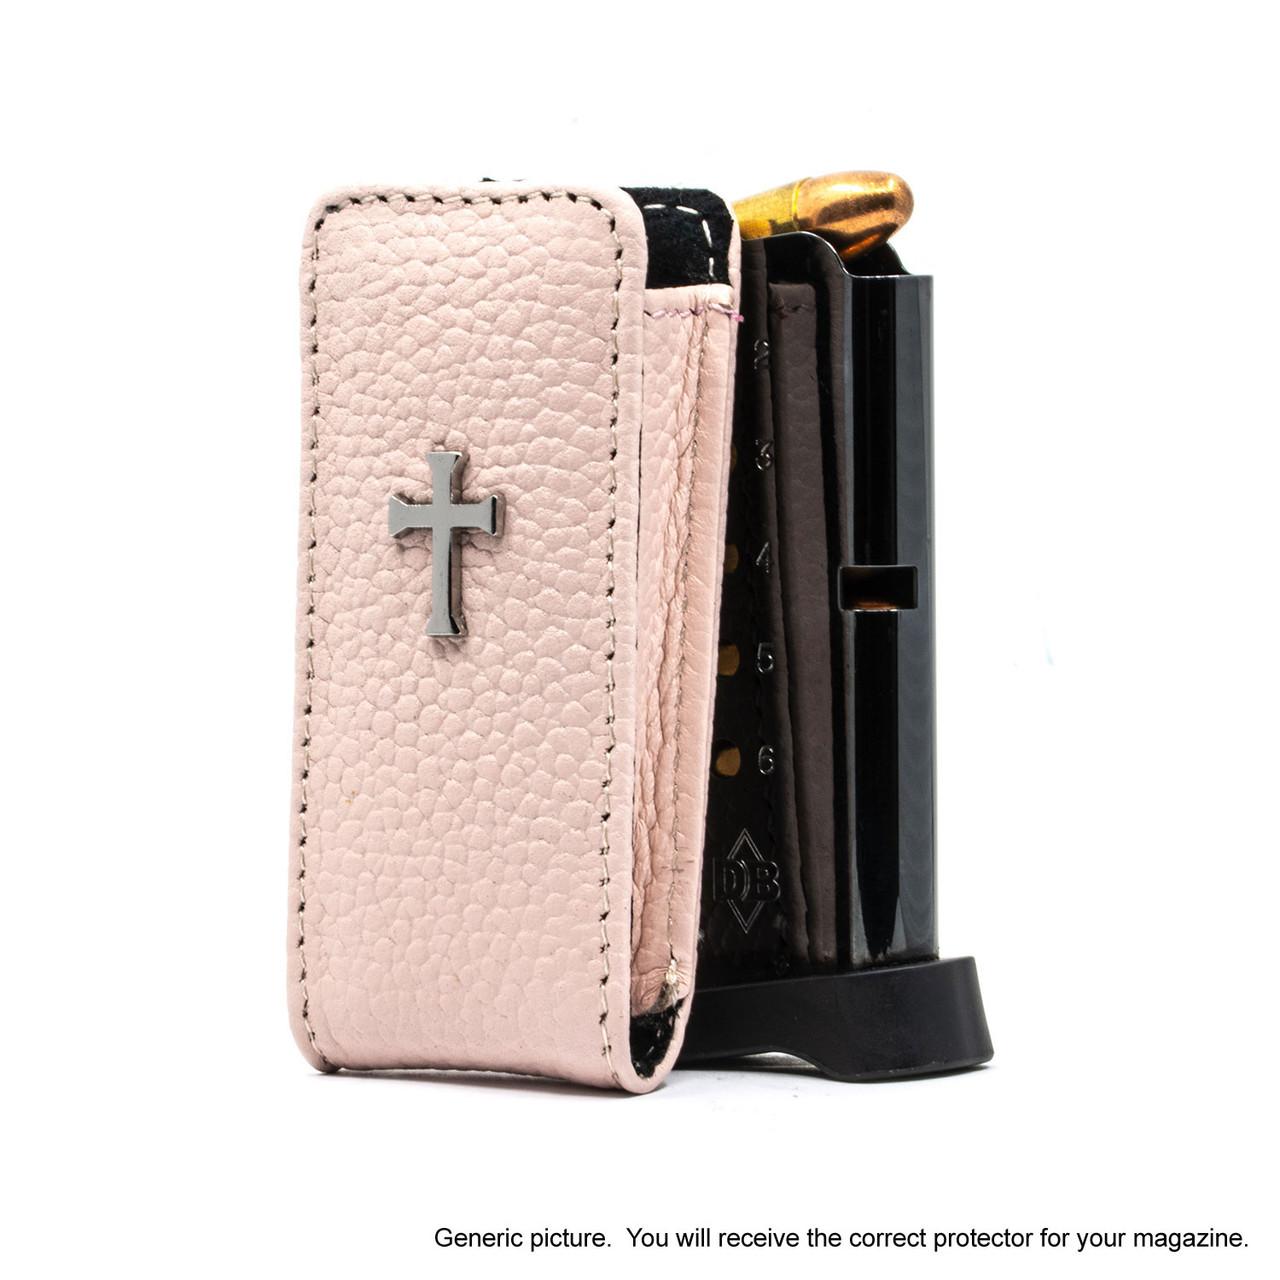 Springfield XDS 40 Pink Carry Faithfully Cross Magazine Pocket Protector